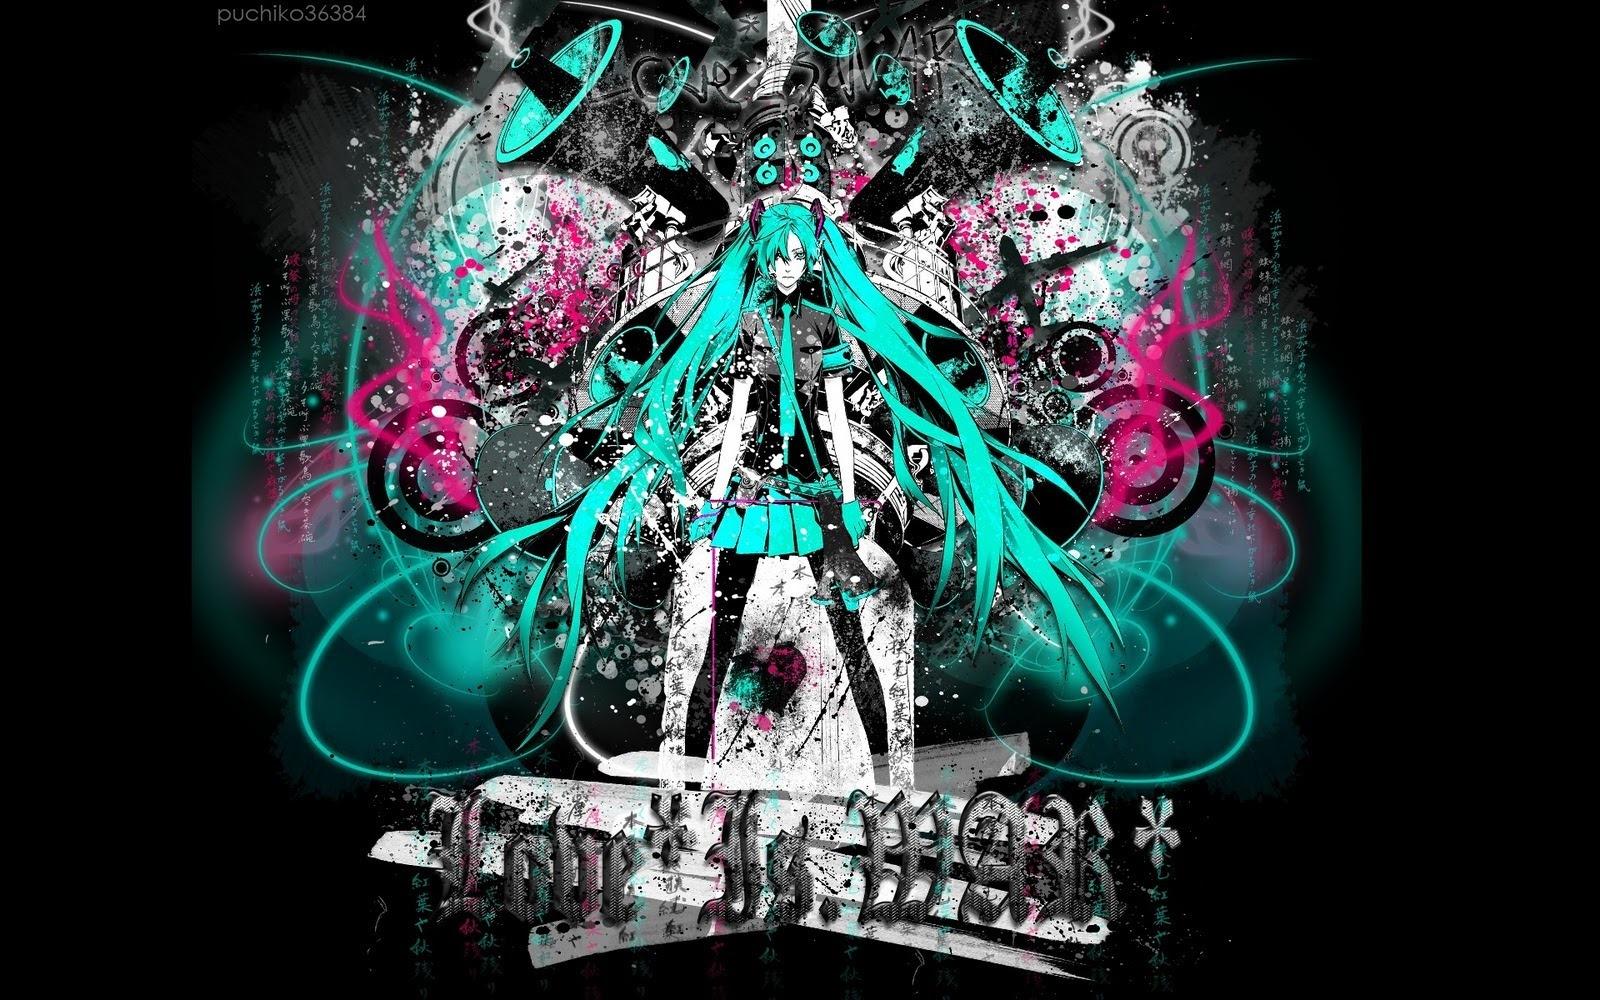 Miku Love Is War Hatsune Miku Wallpaper 20486032 Fanpop